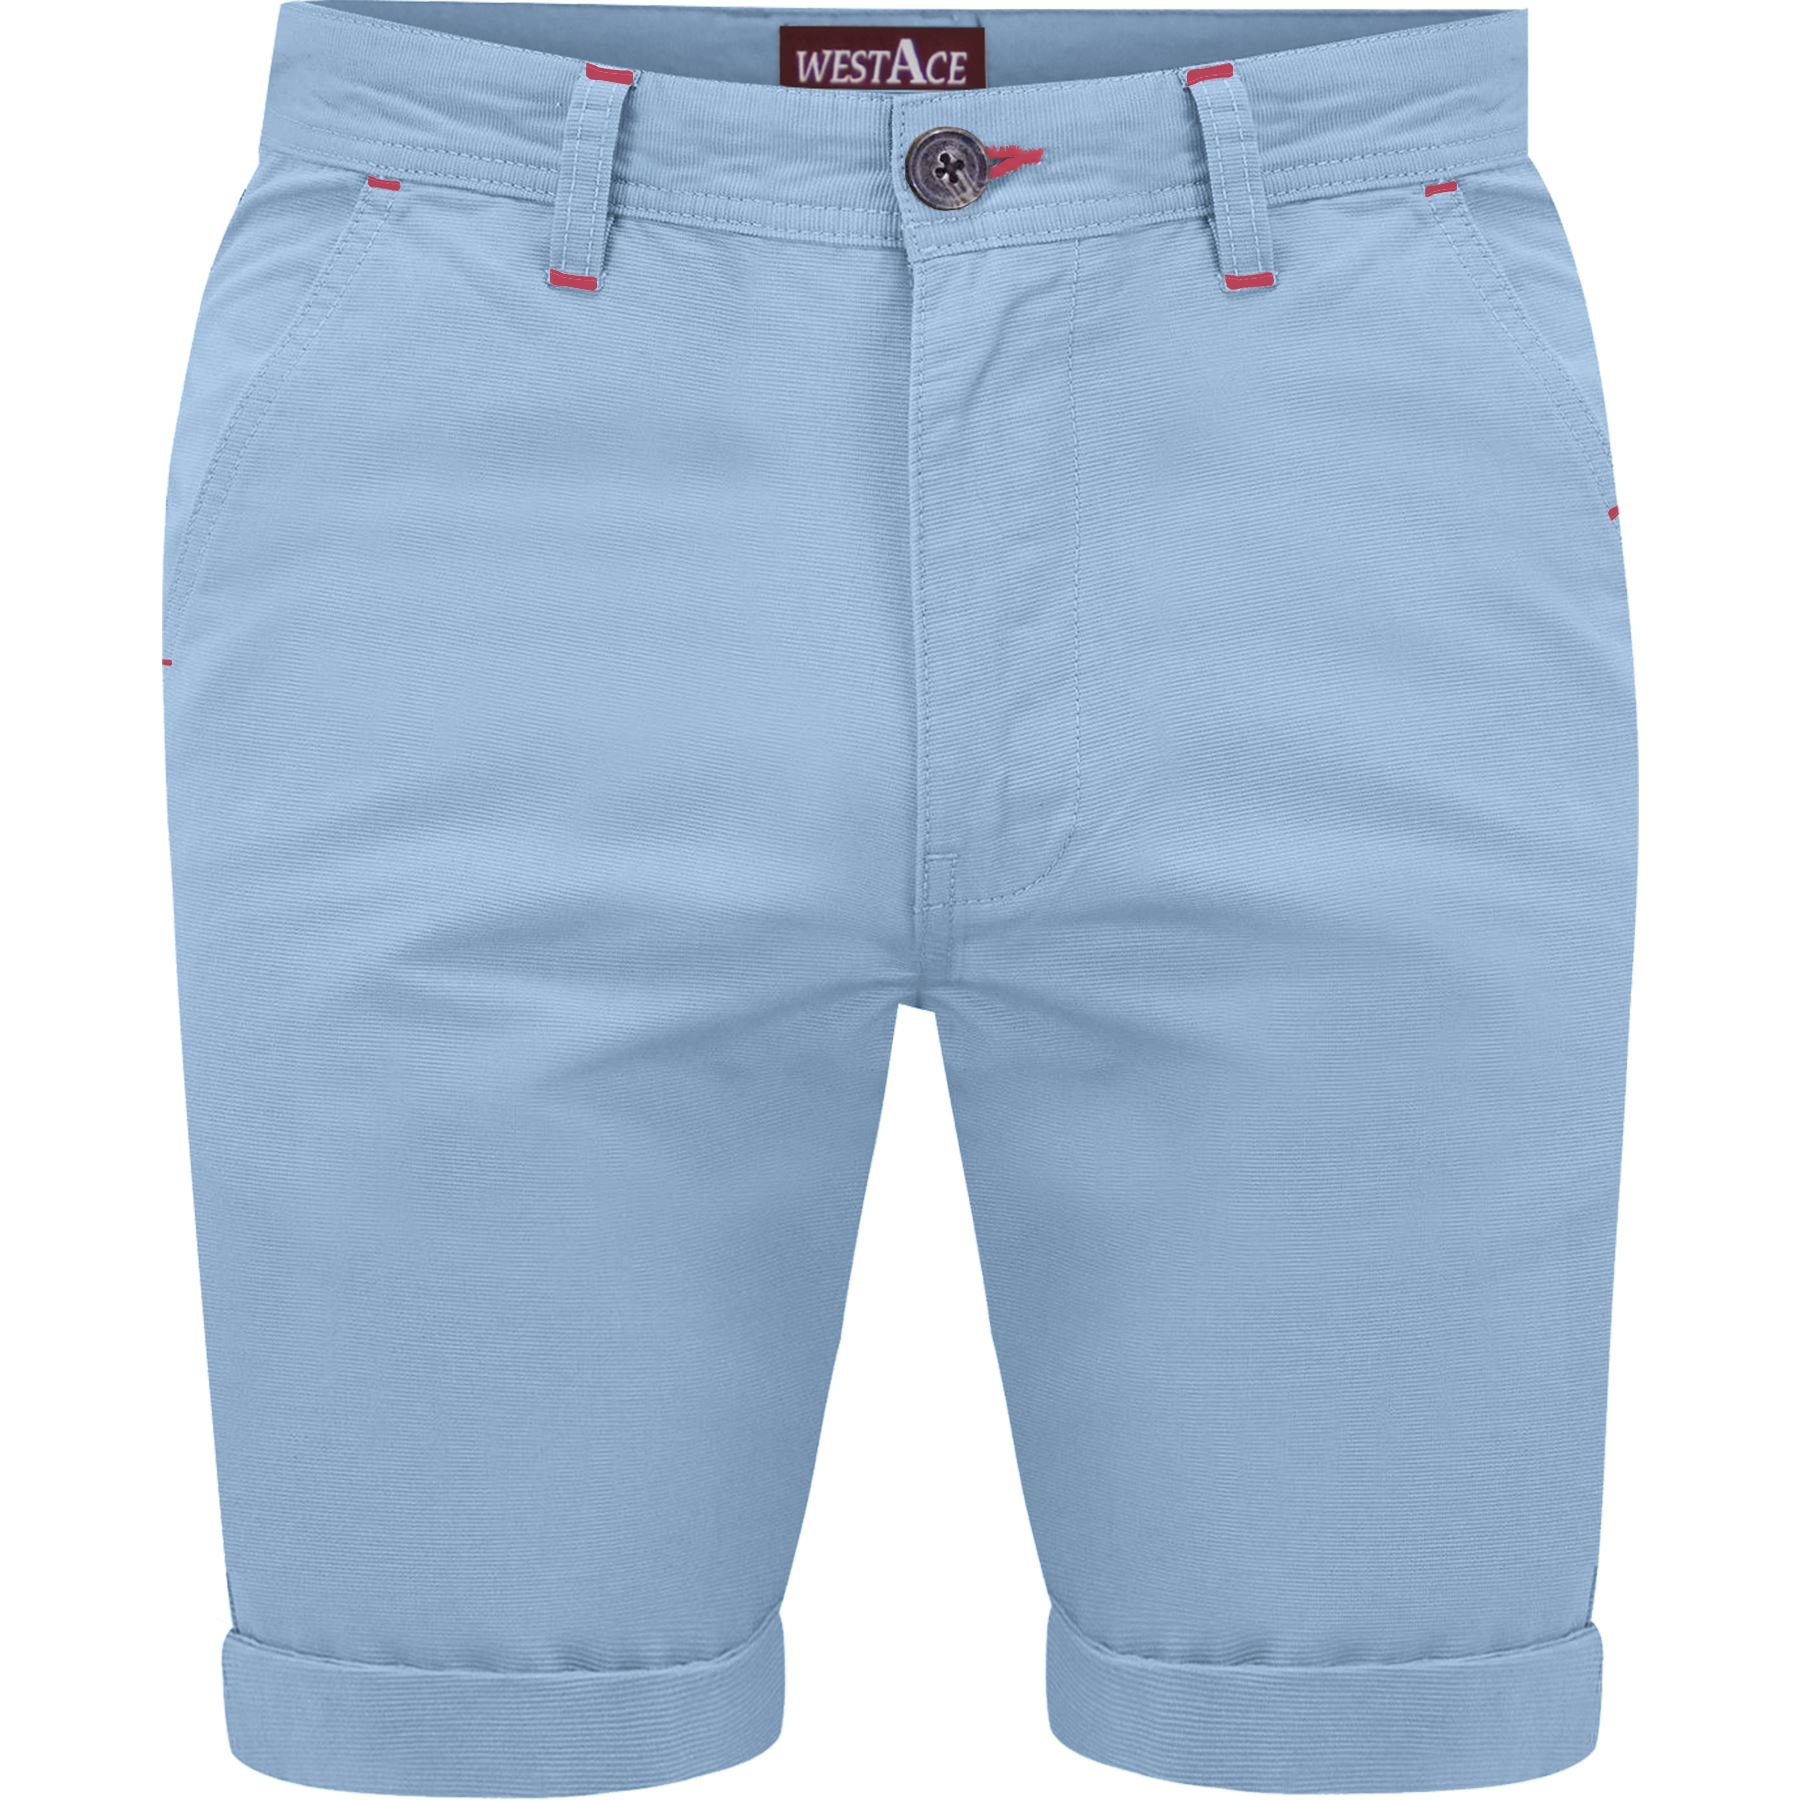 Mens-Chino-Shorts-Cotton-Summer-Casual-Jeans-Cargo-Combat-Half-Pants-Casual-New thumbnail 13